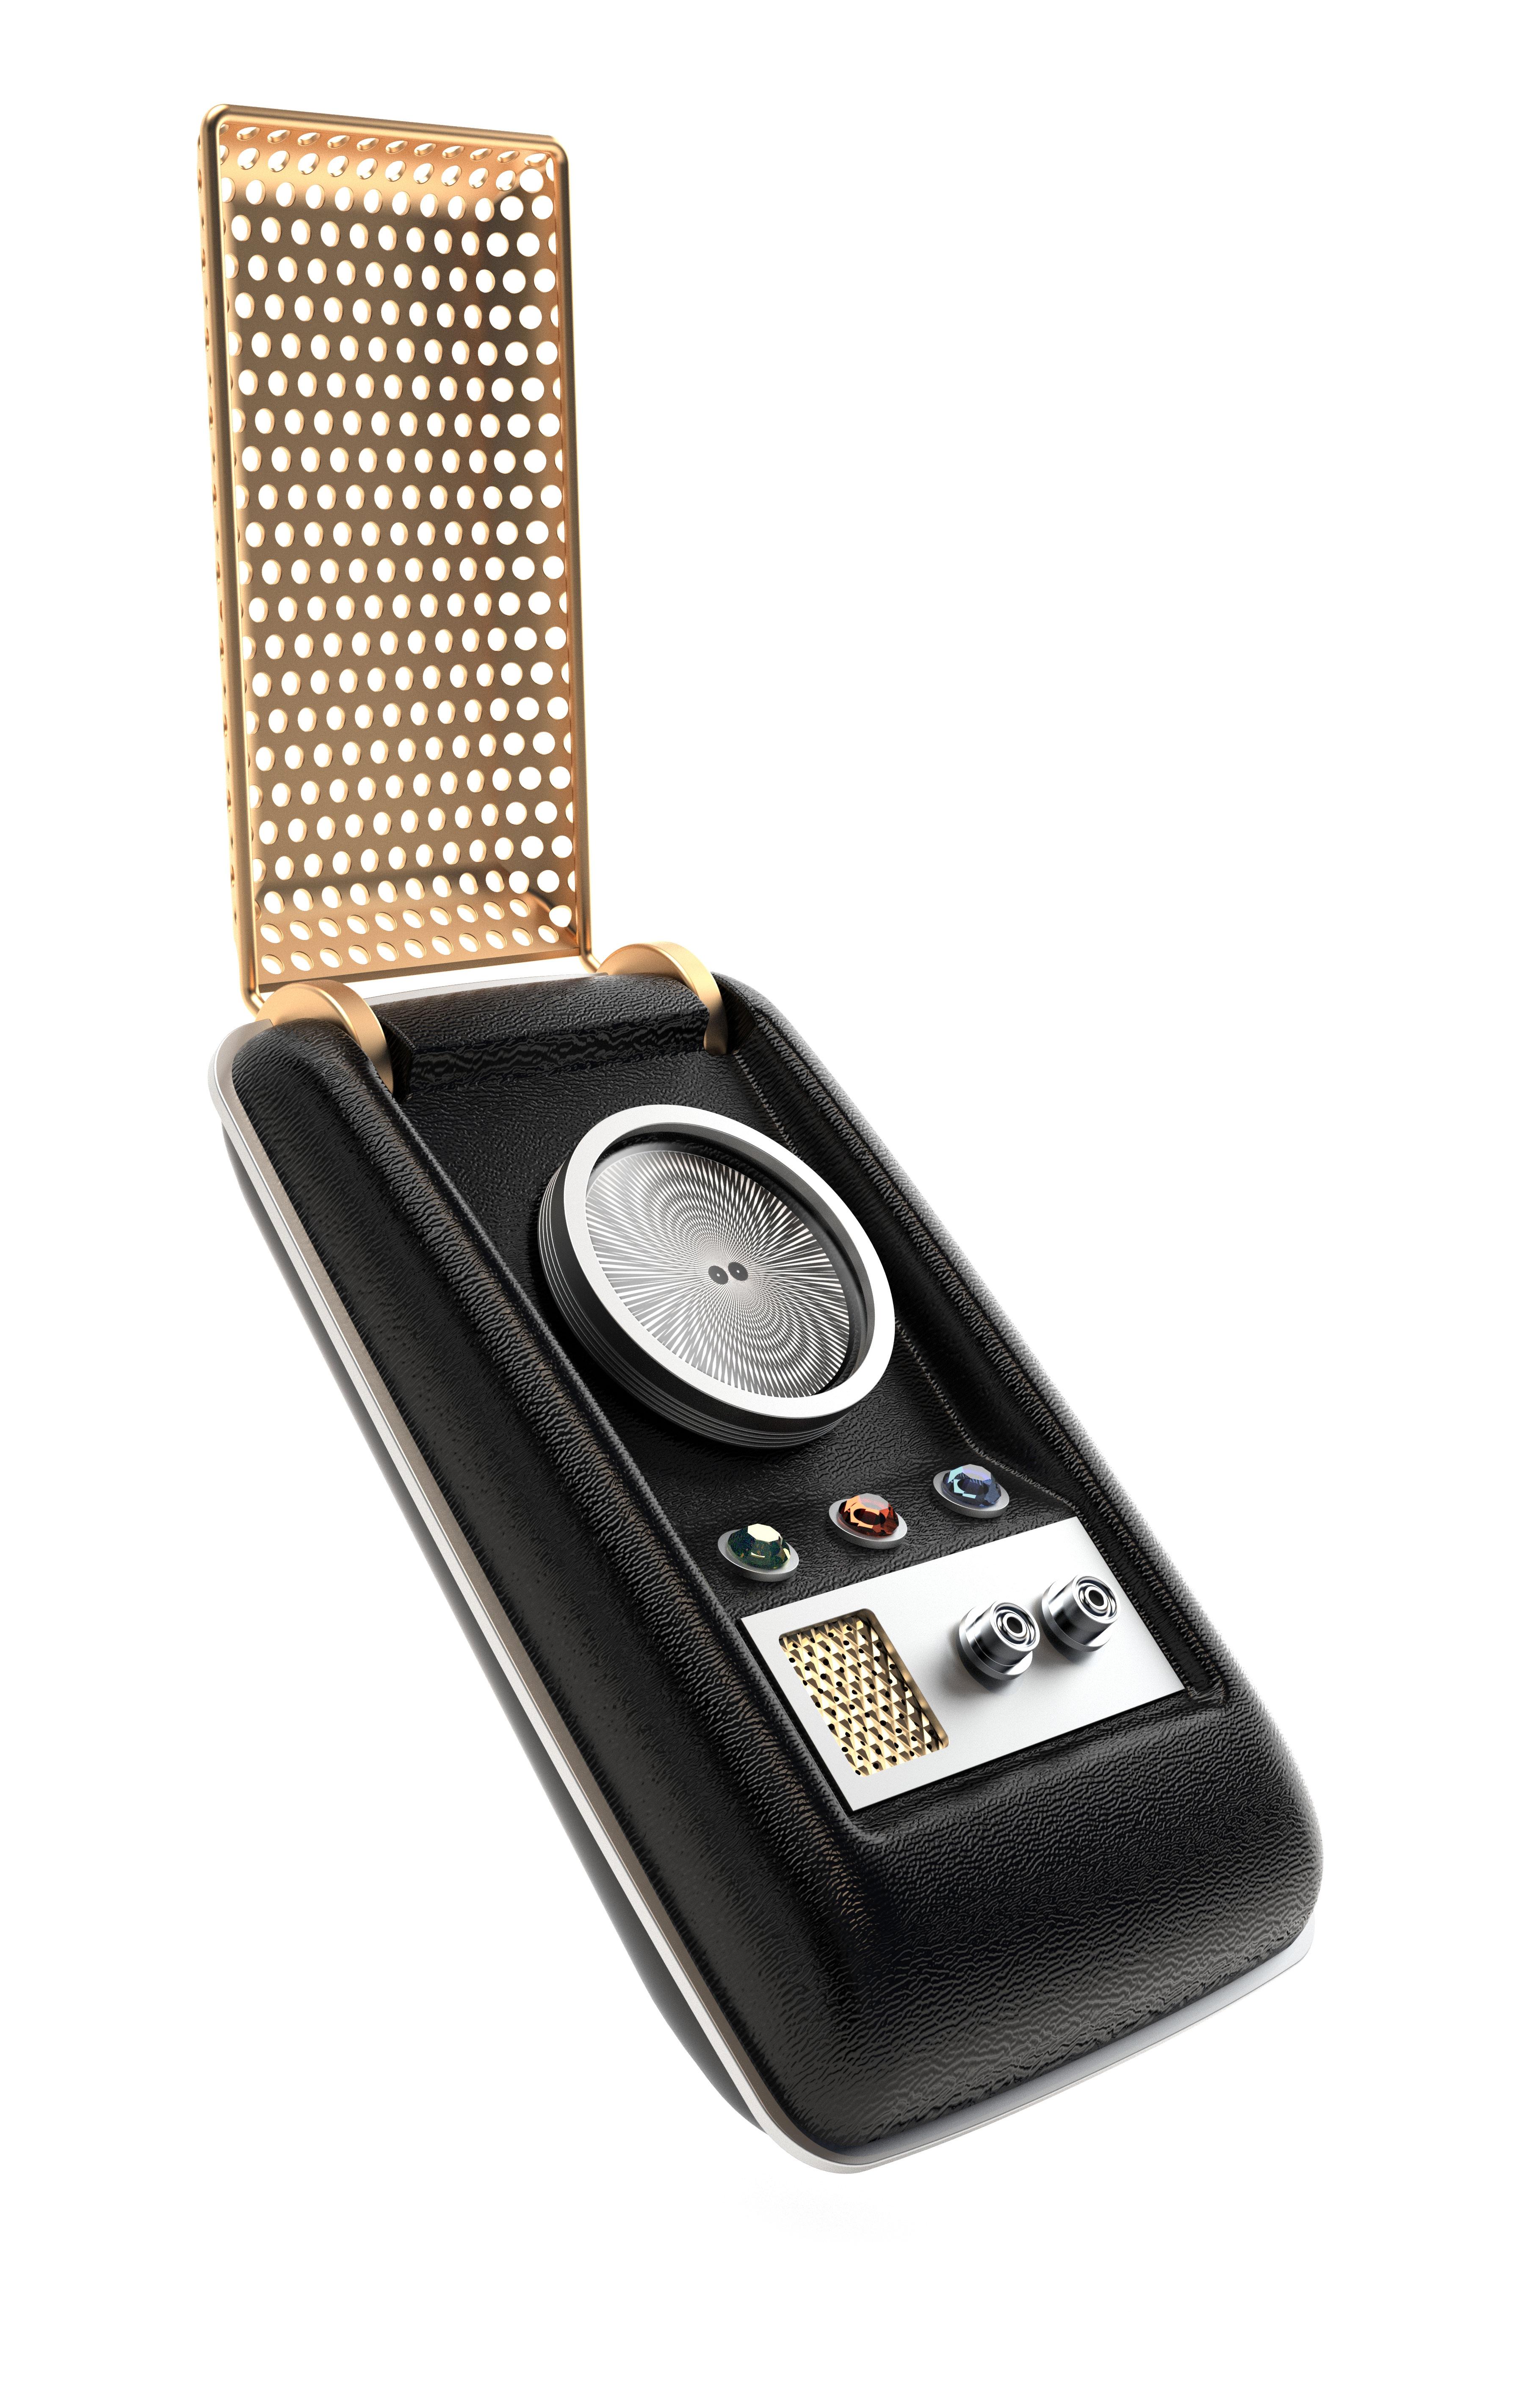 Star Trek Communicator replica lets you take calls 23rd ...